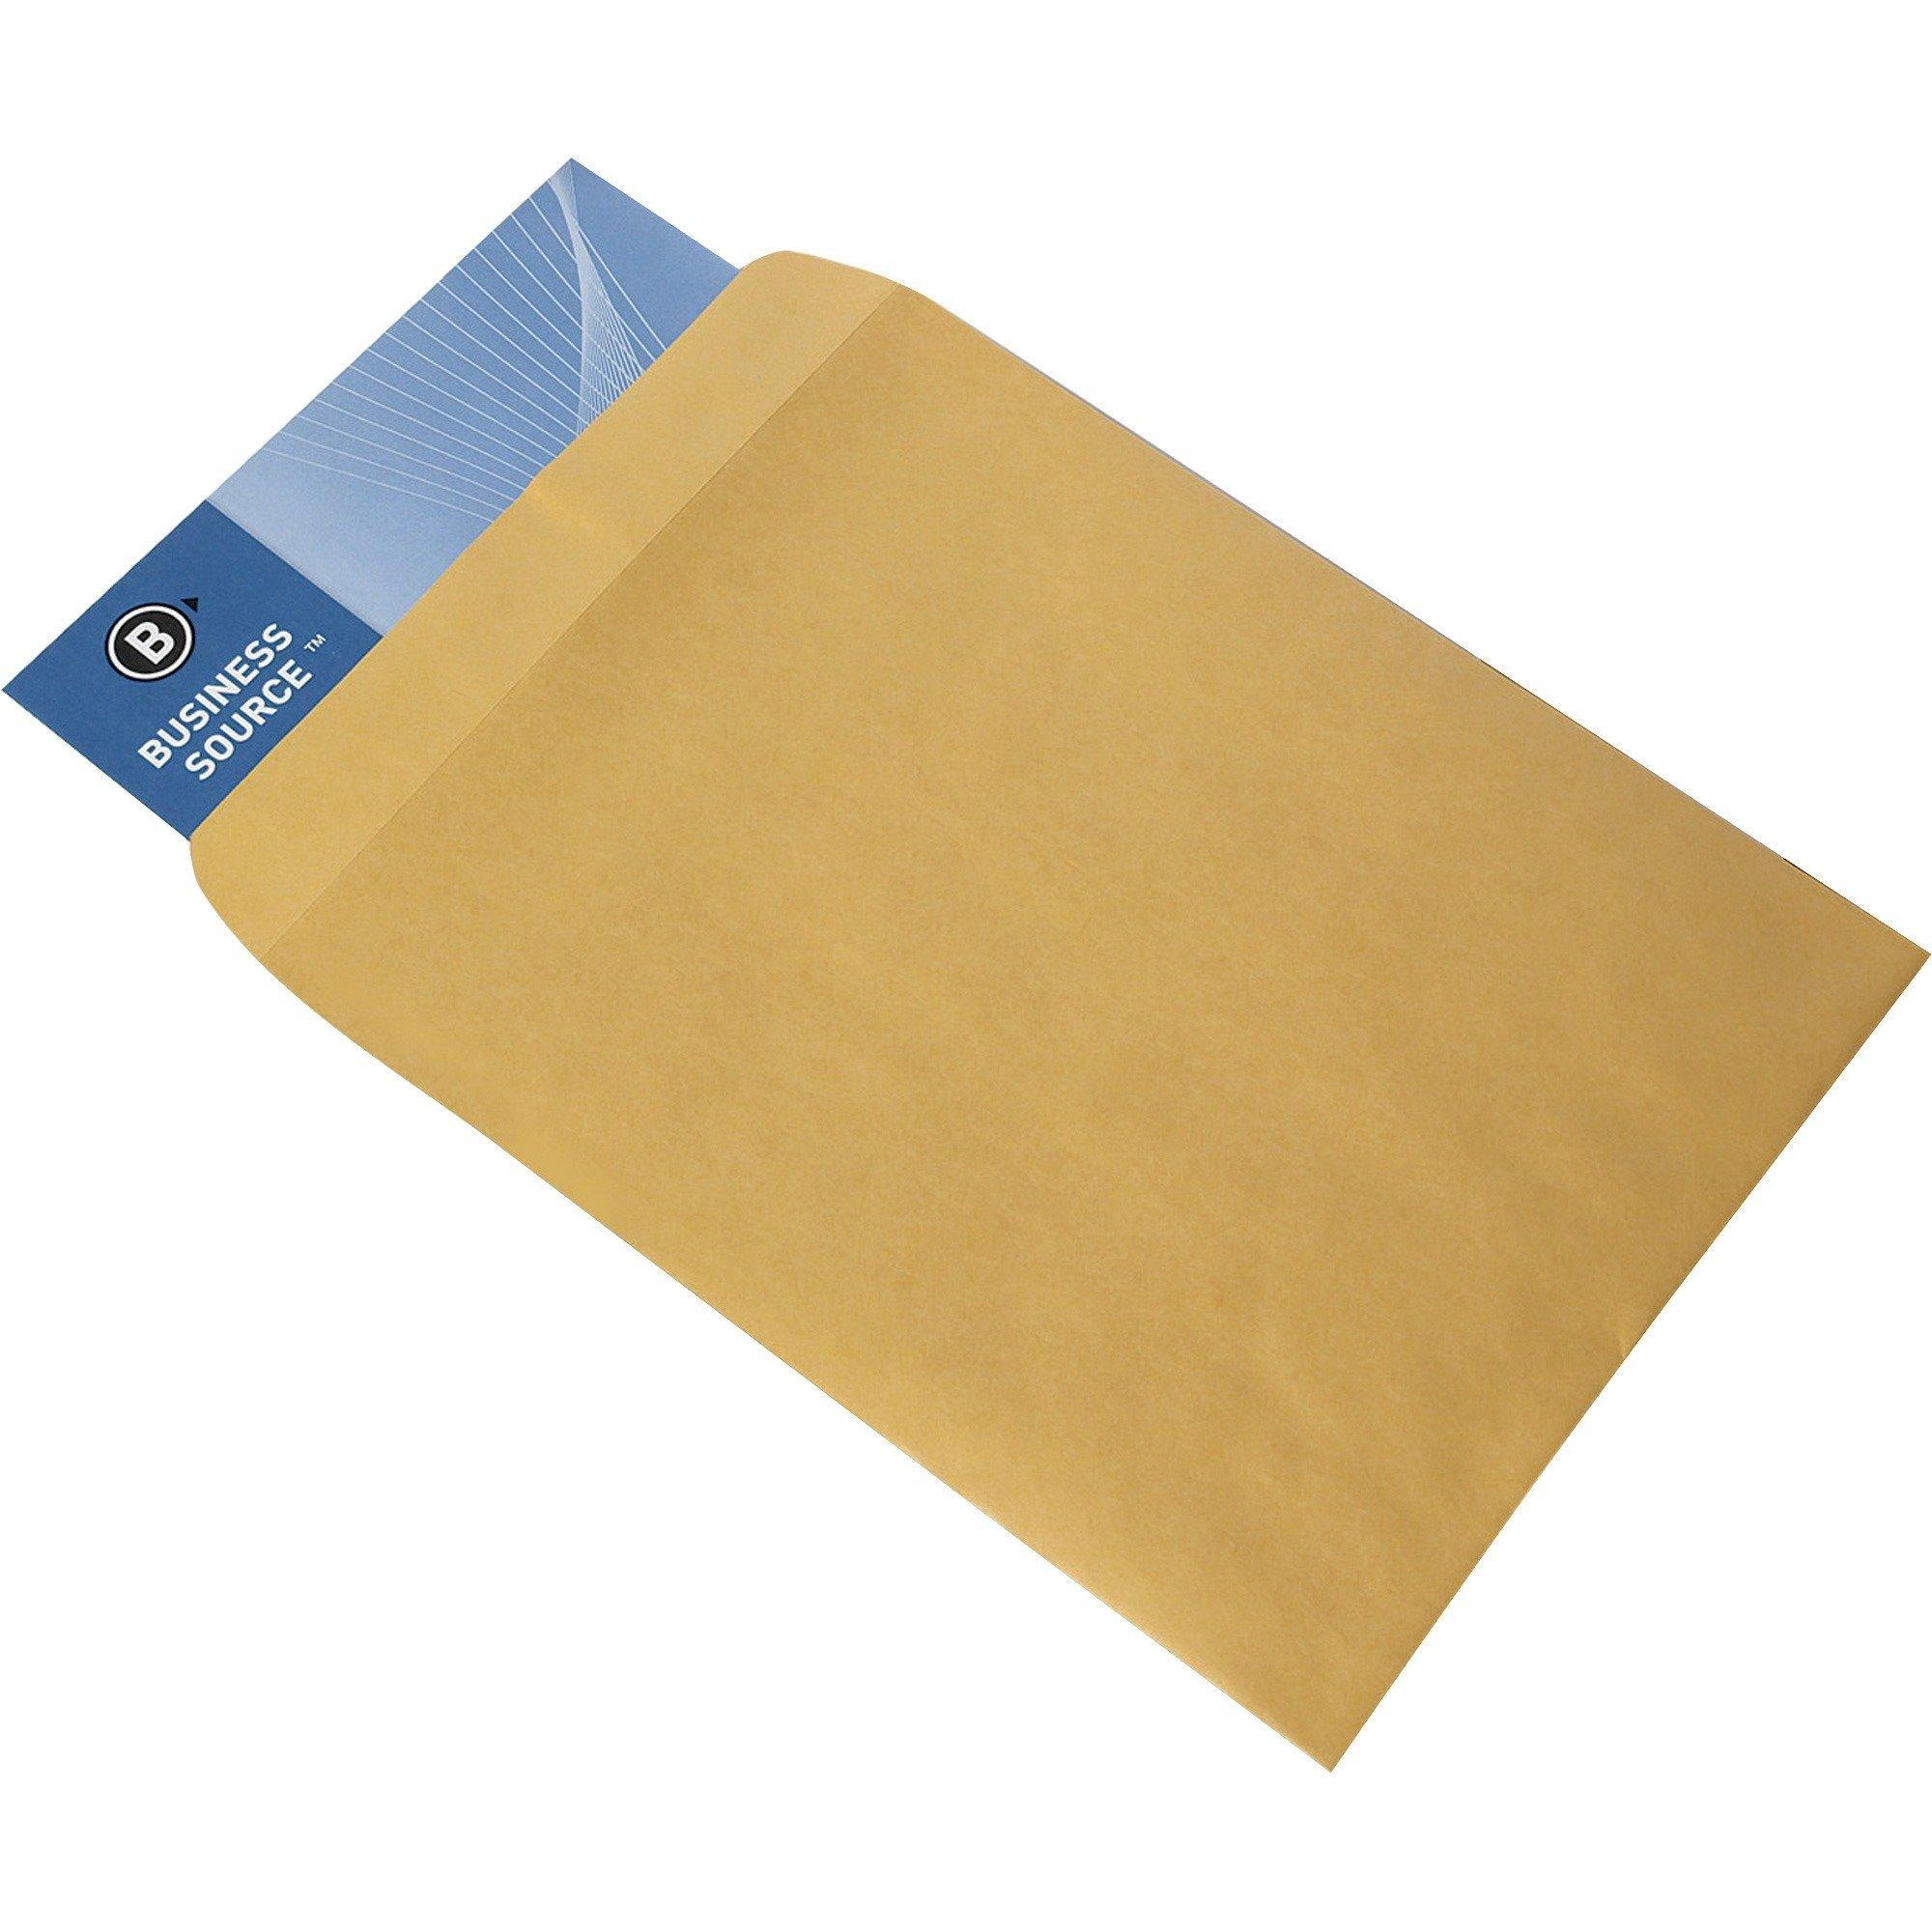 "Business Source 9"" x 12"" Kraft Gummed Catalog Envelopes - 250/Box"